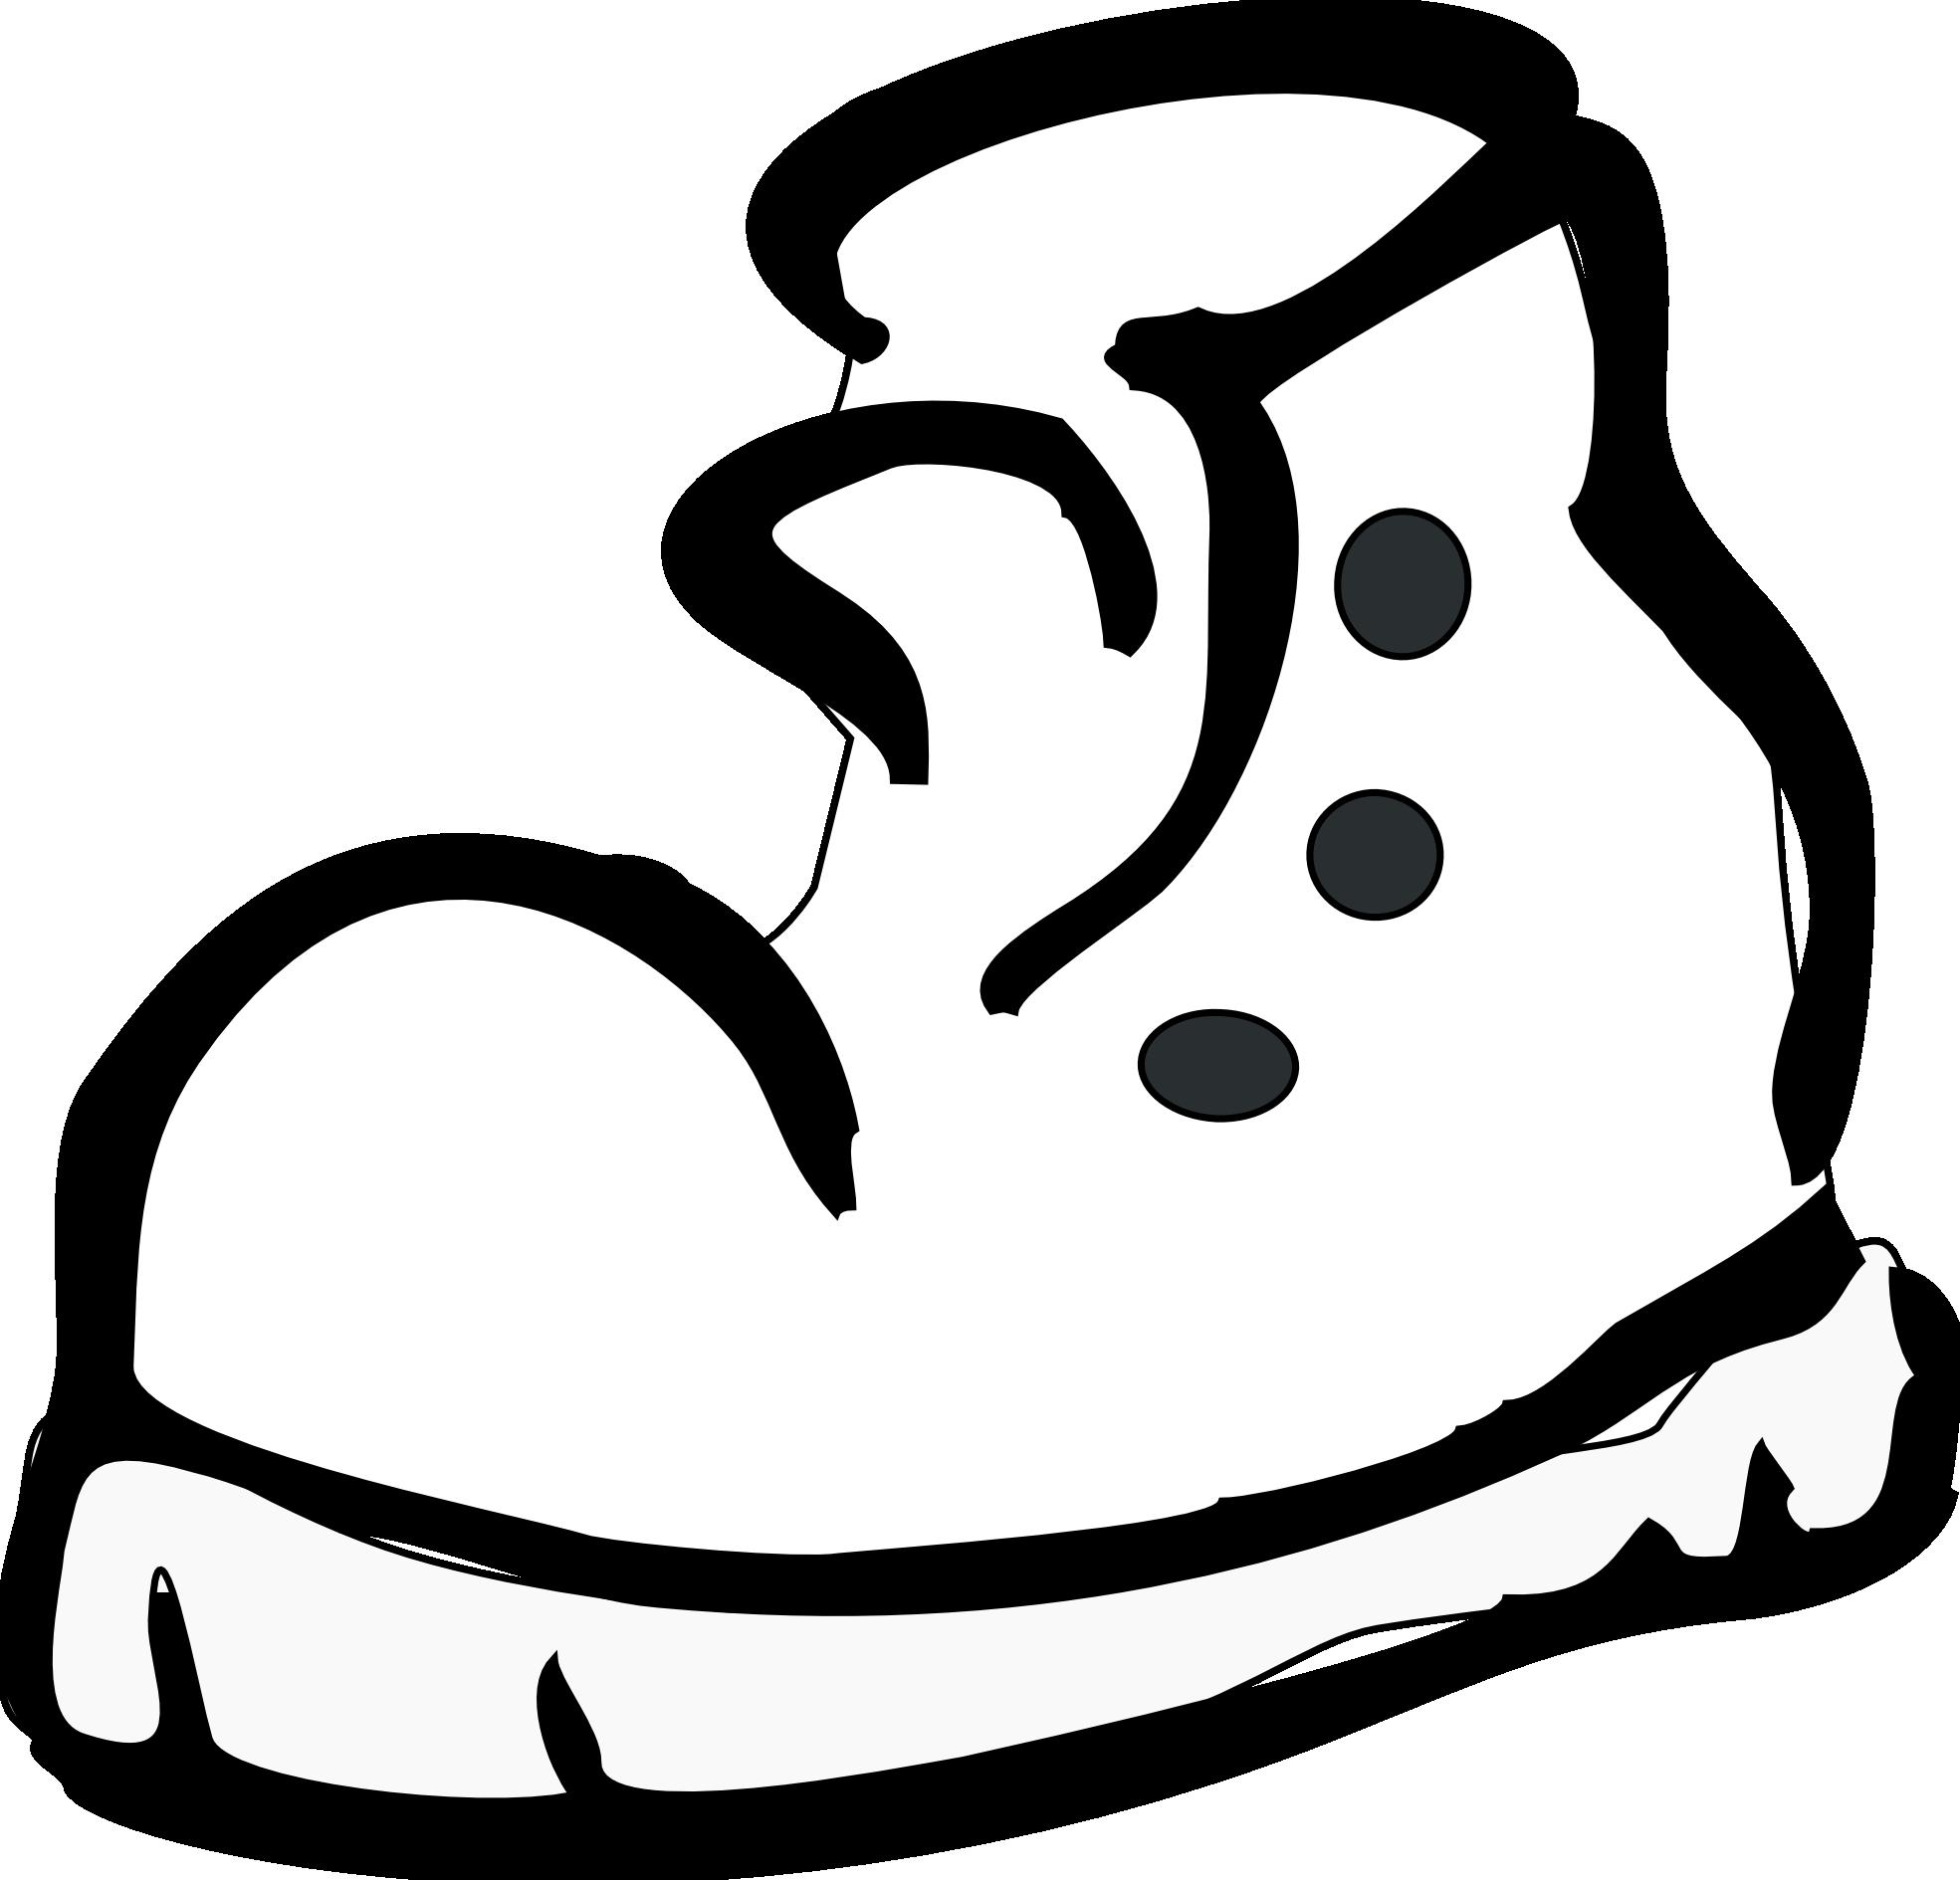 1969x1889 Running Shoe Telephone Clip Art Image